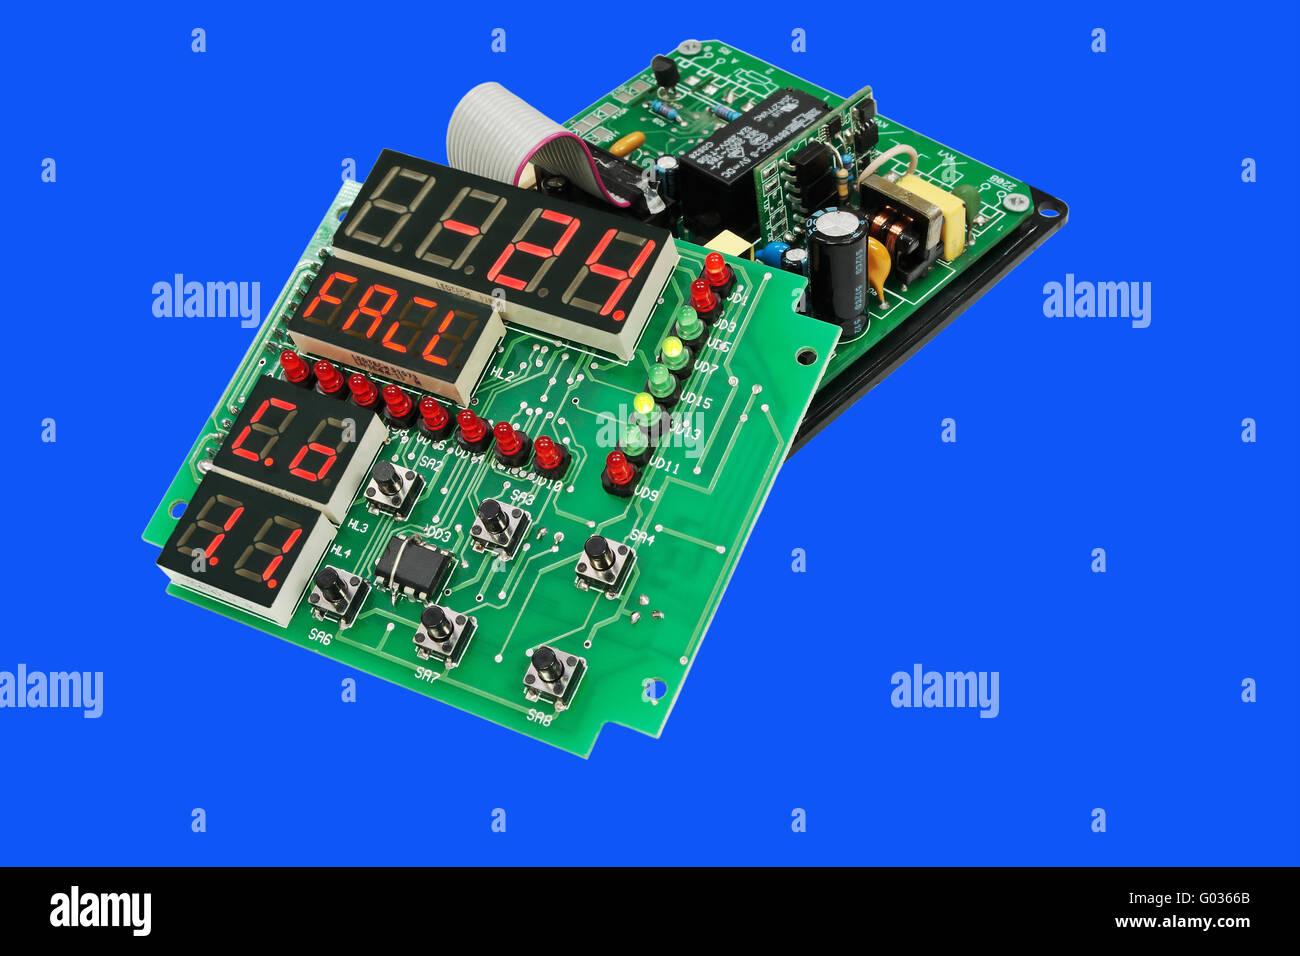 Disassembled electronic device. - Stock Image